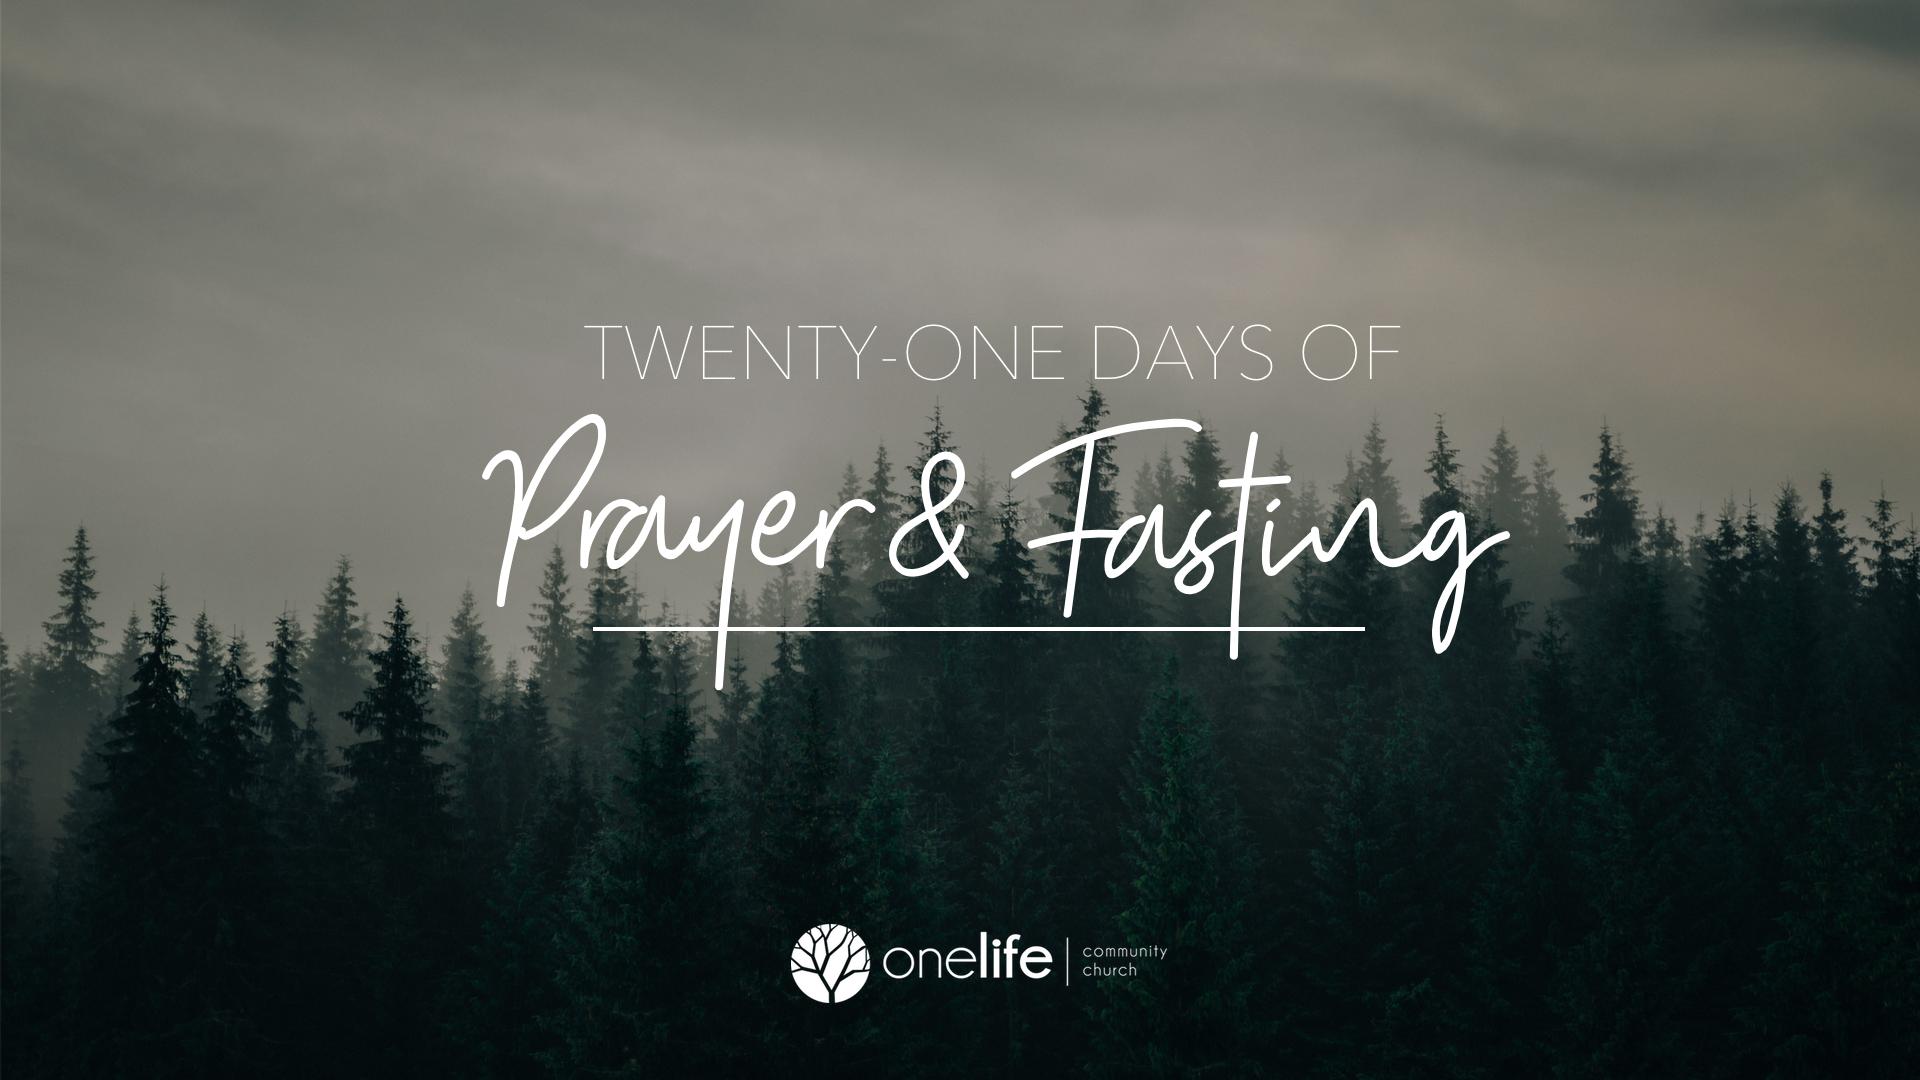 Twenty-One Days of Prayer & Fasting - We started the year of 2018 with Twenty-One Days of Prayer & Fasting!